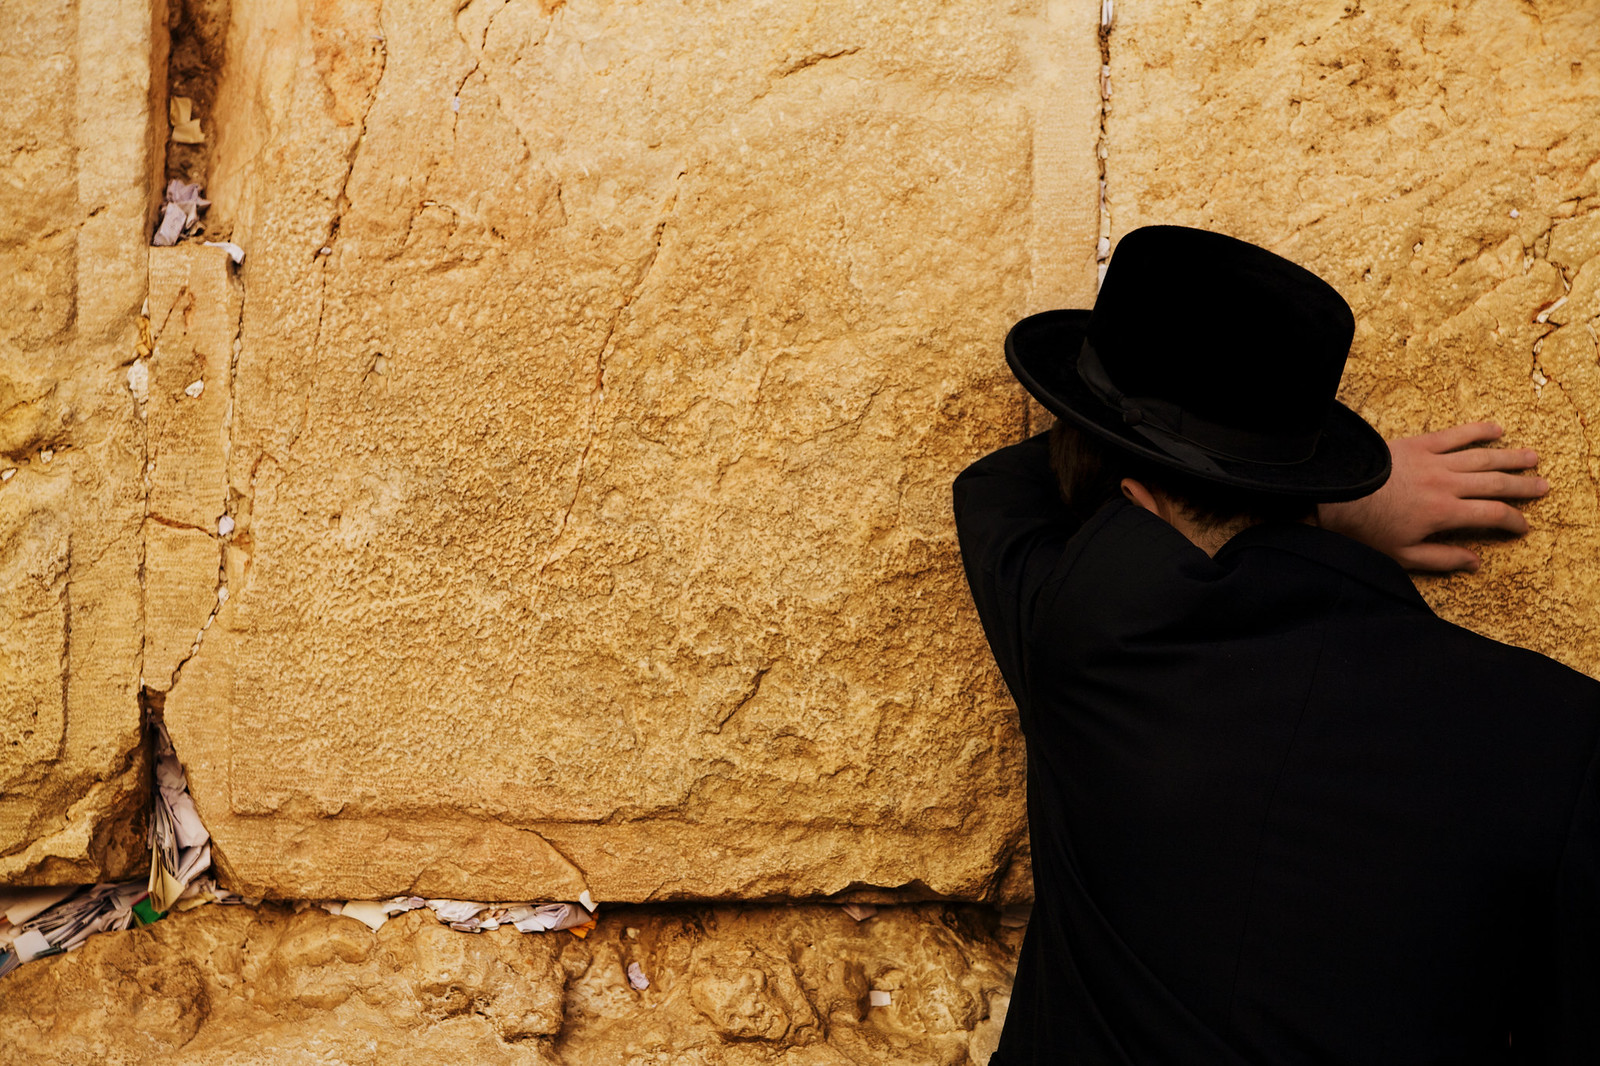 Jerusalem_Western Wall_5_Noam Chen_IMOT